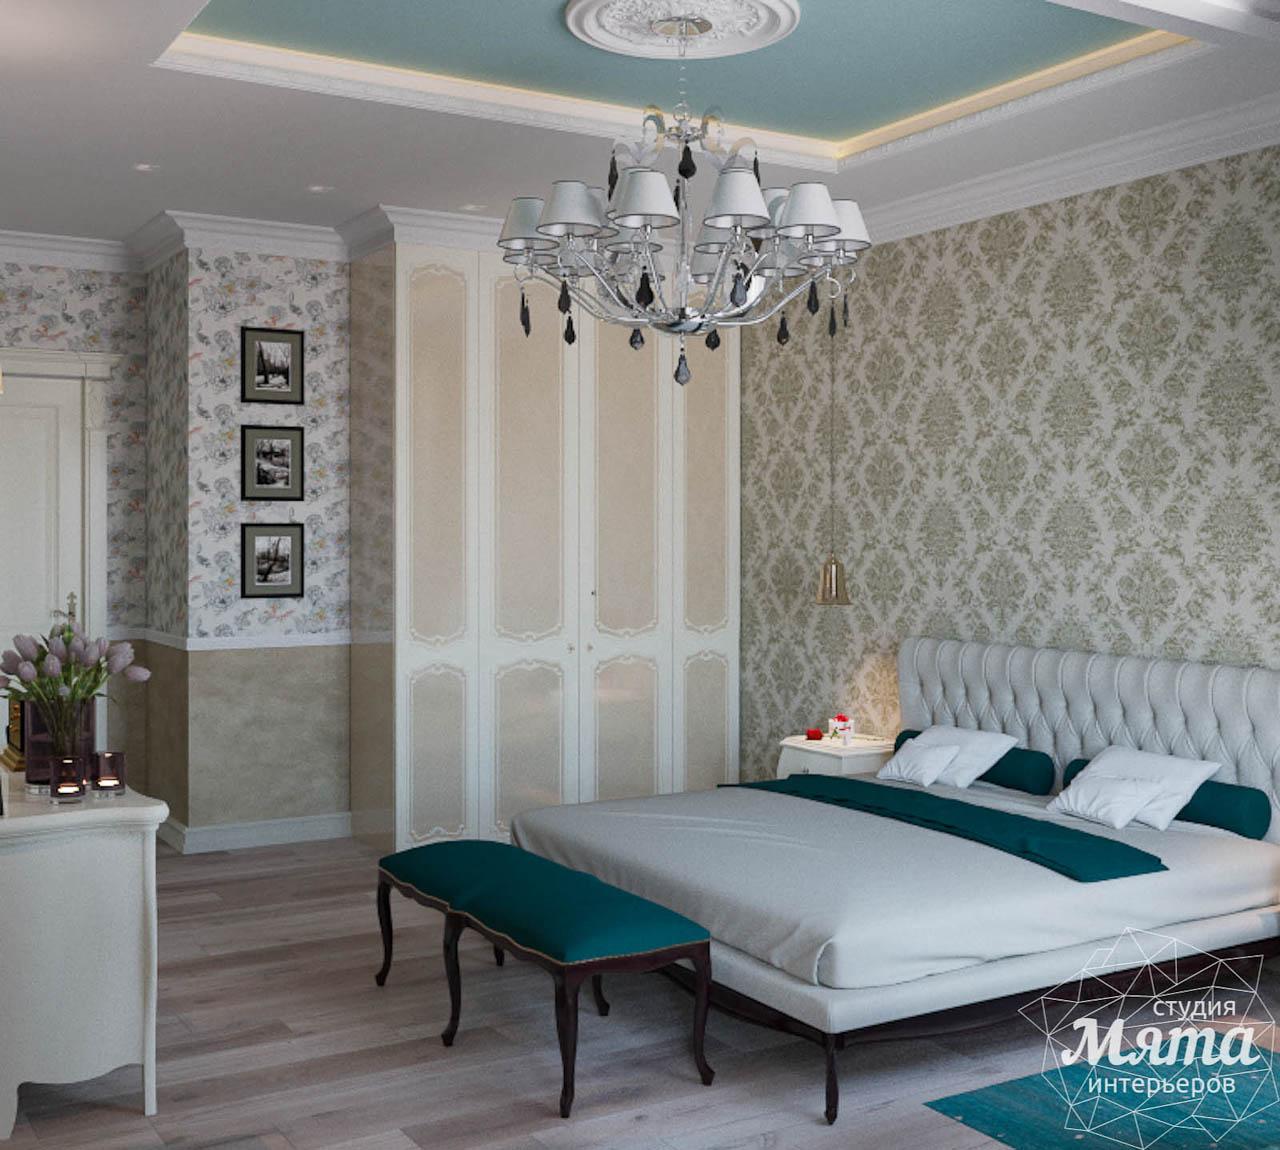 Дизайн интерьера и ремонт трехкомнатной квартиры в Карасьозерском 2 img942054647